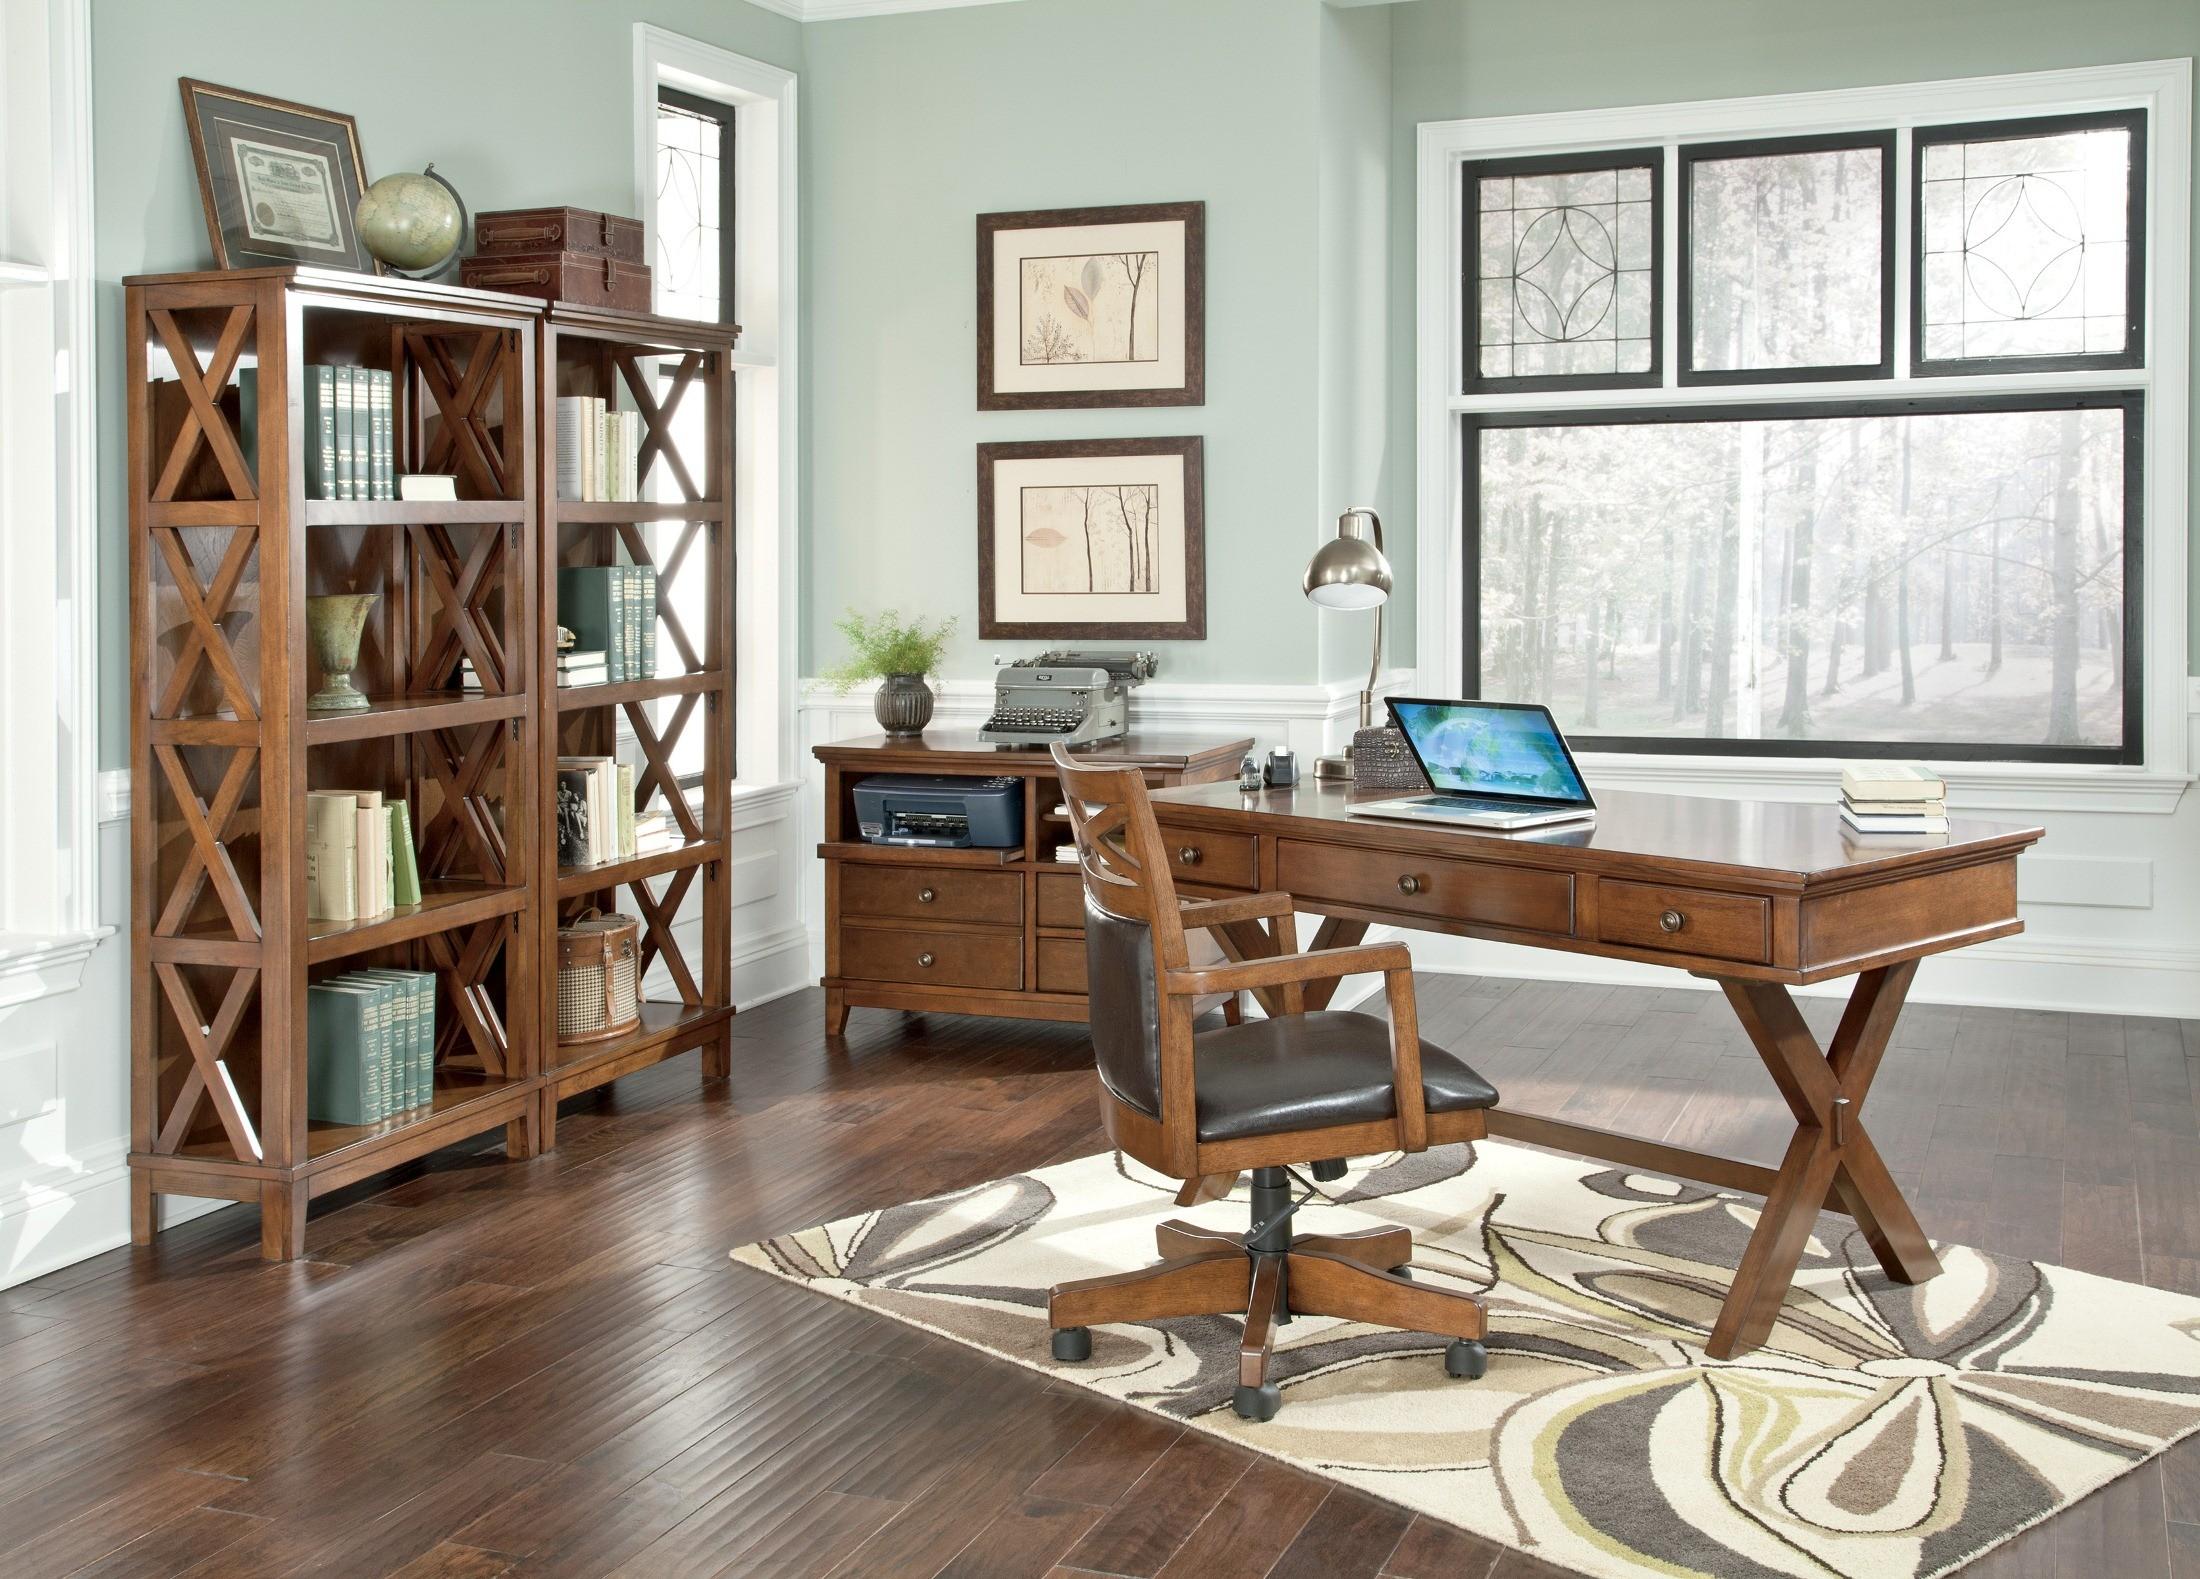 Burkesville Home Office Set, H565